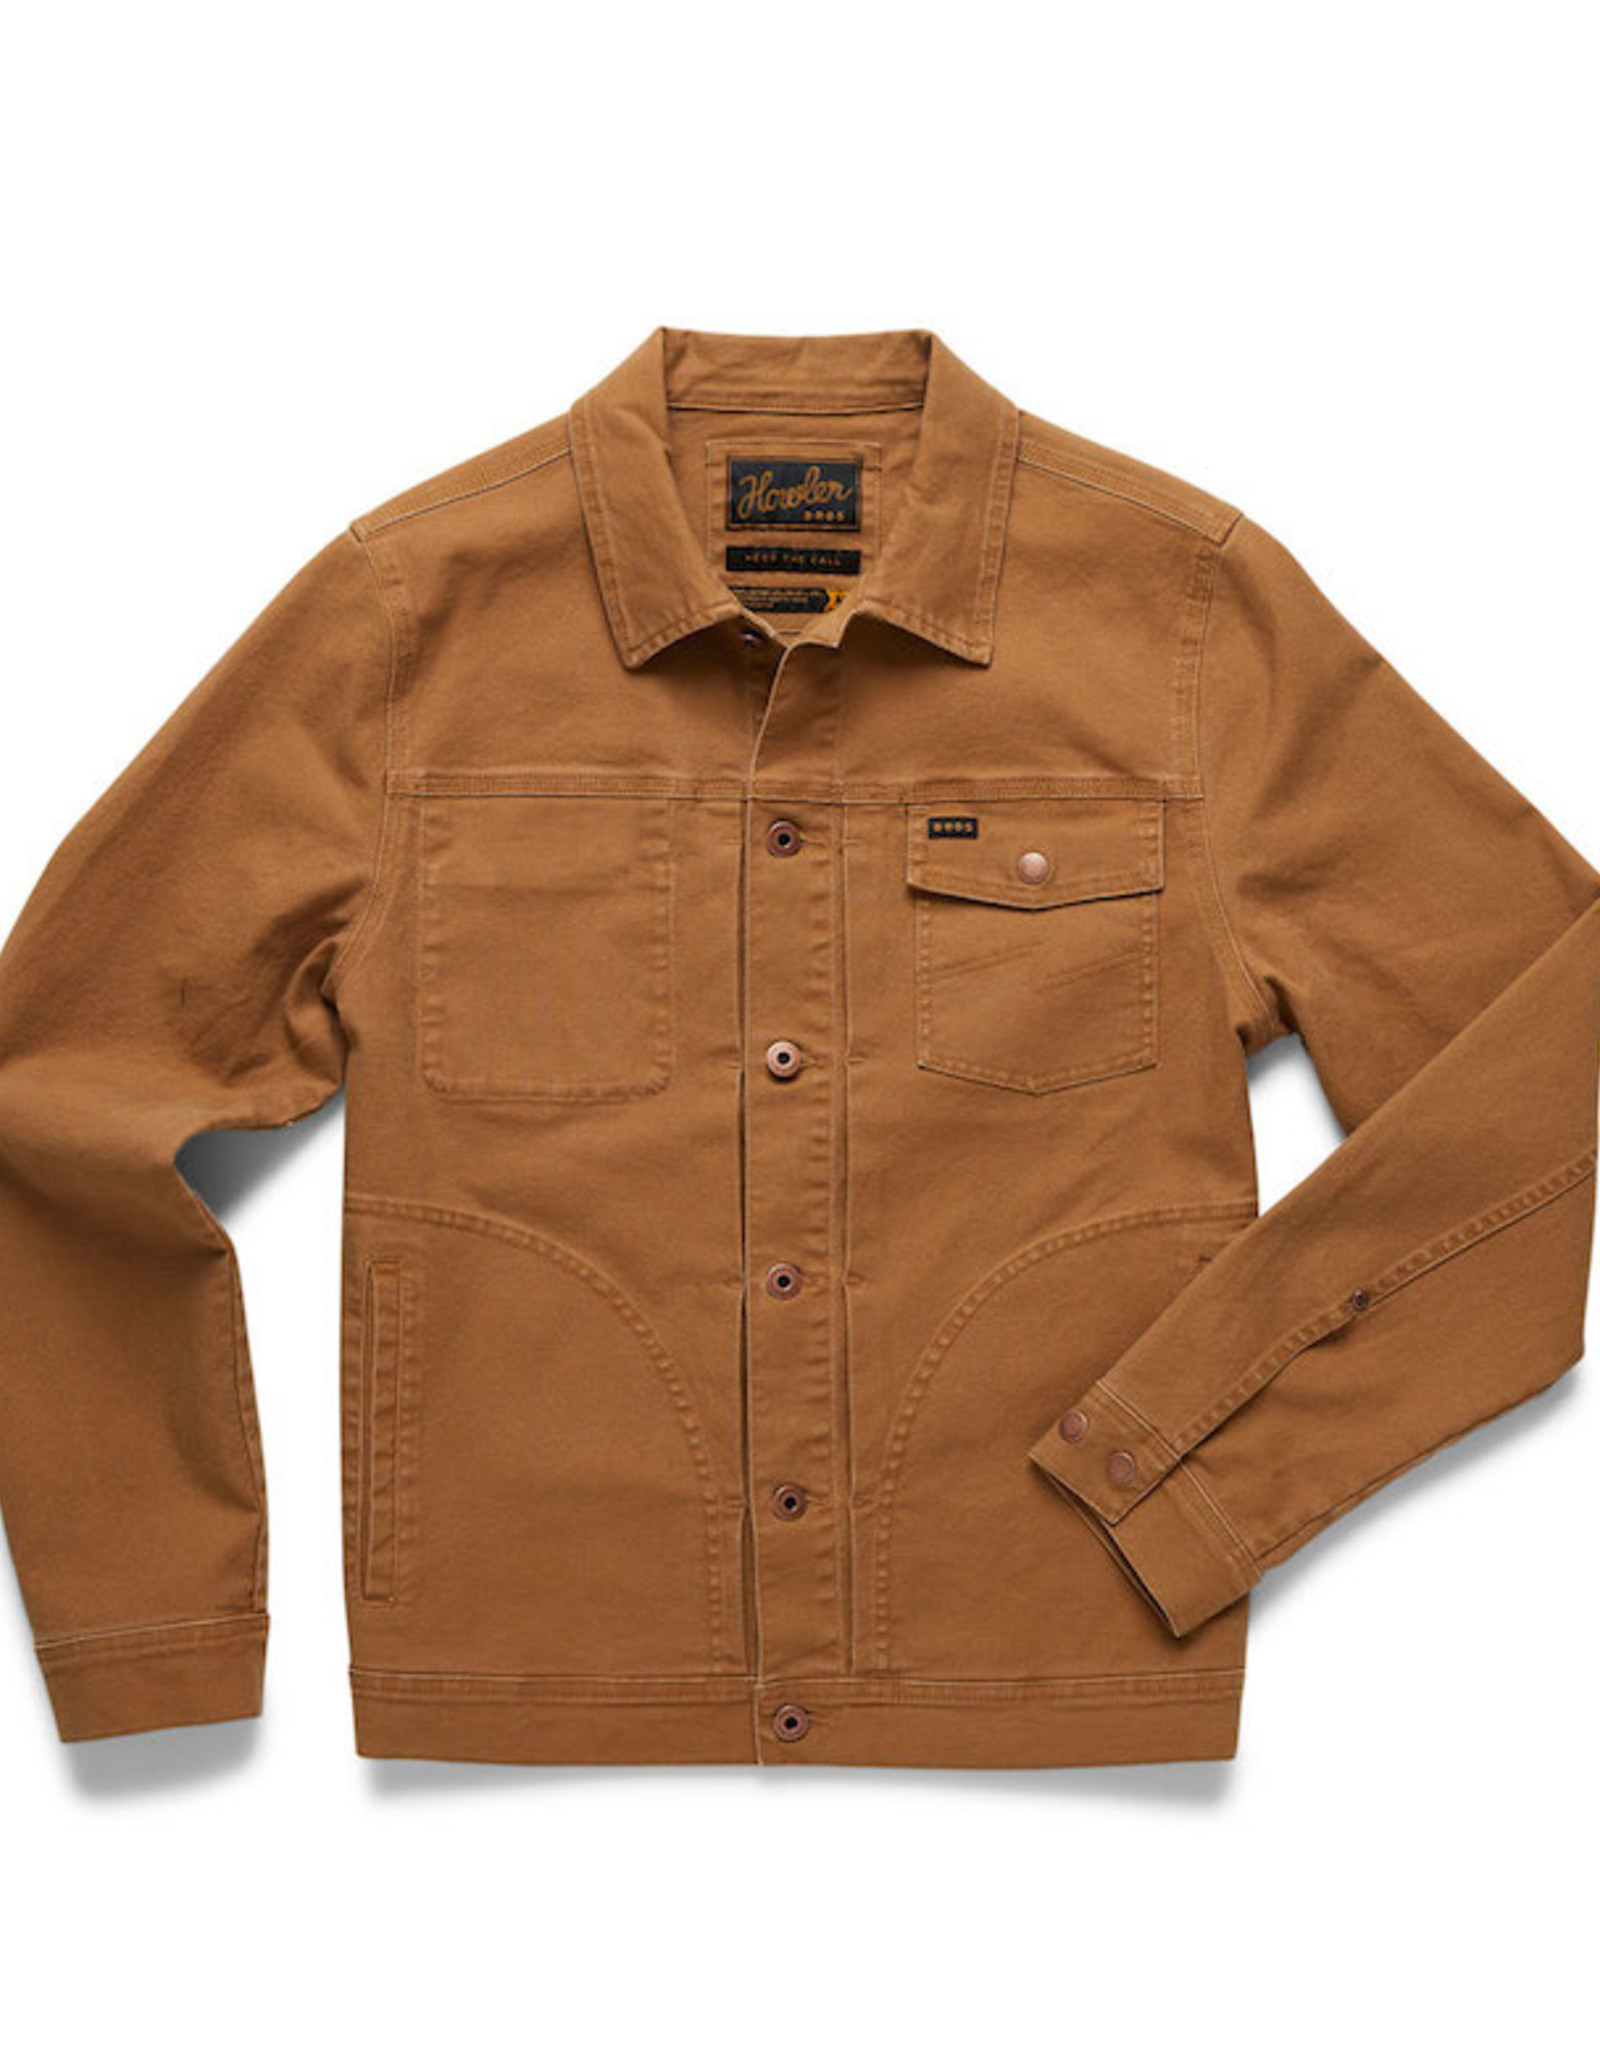 Howler Bros HB Depot Jacket